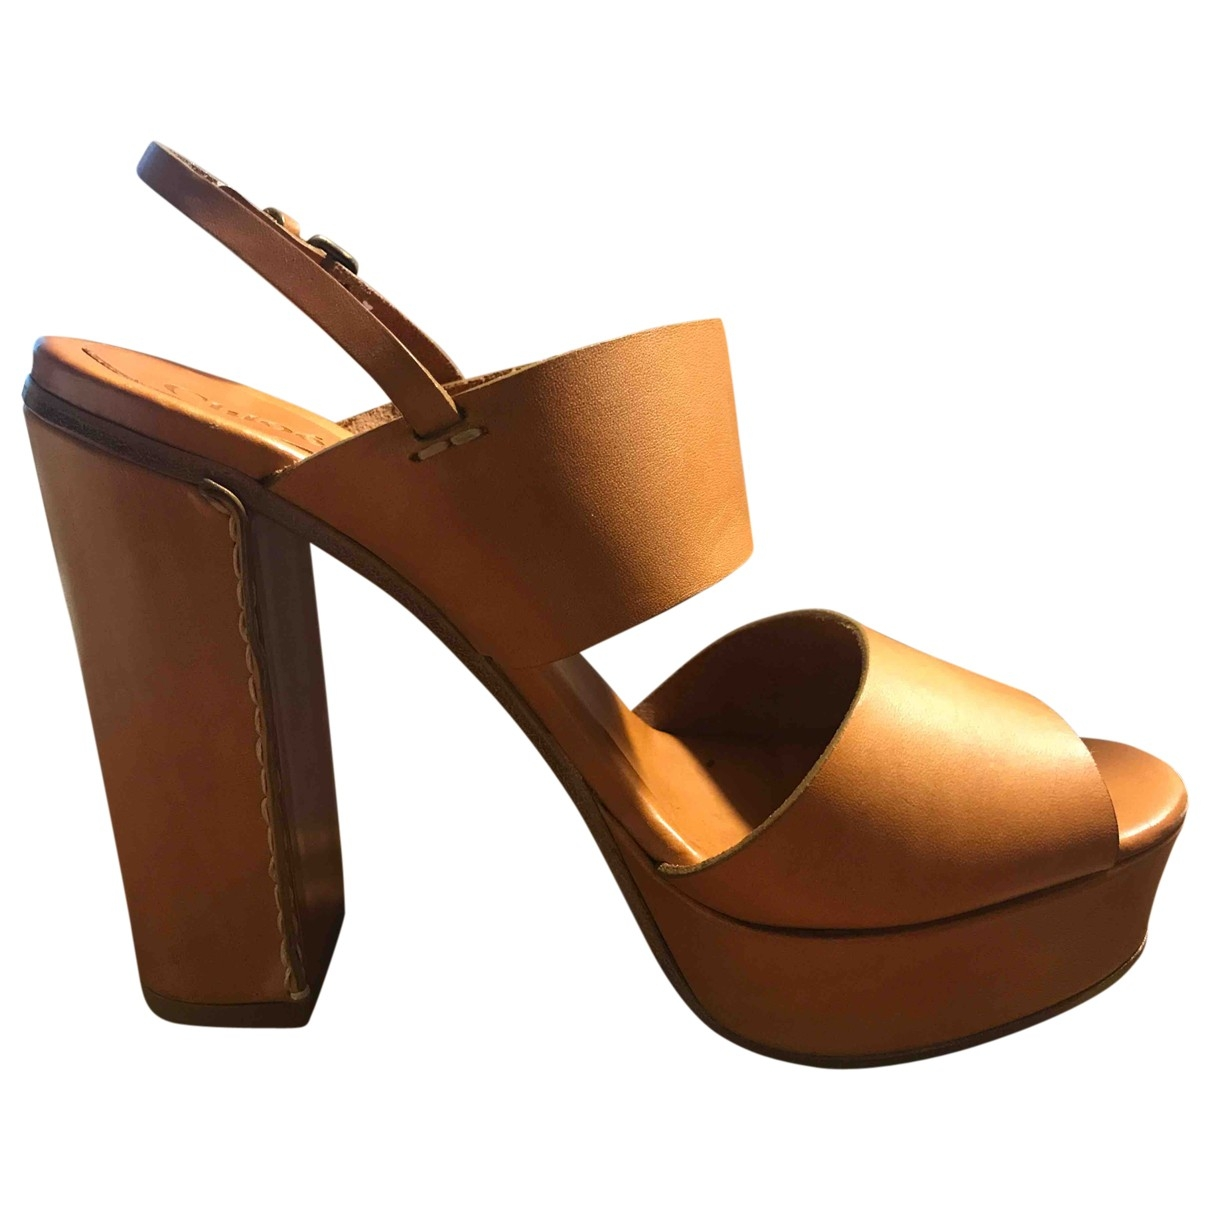 Chloé \N Camel Leather Sandals for Women 39 EU